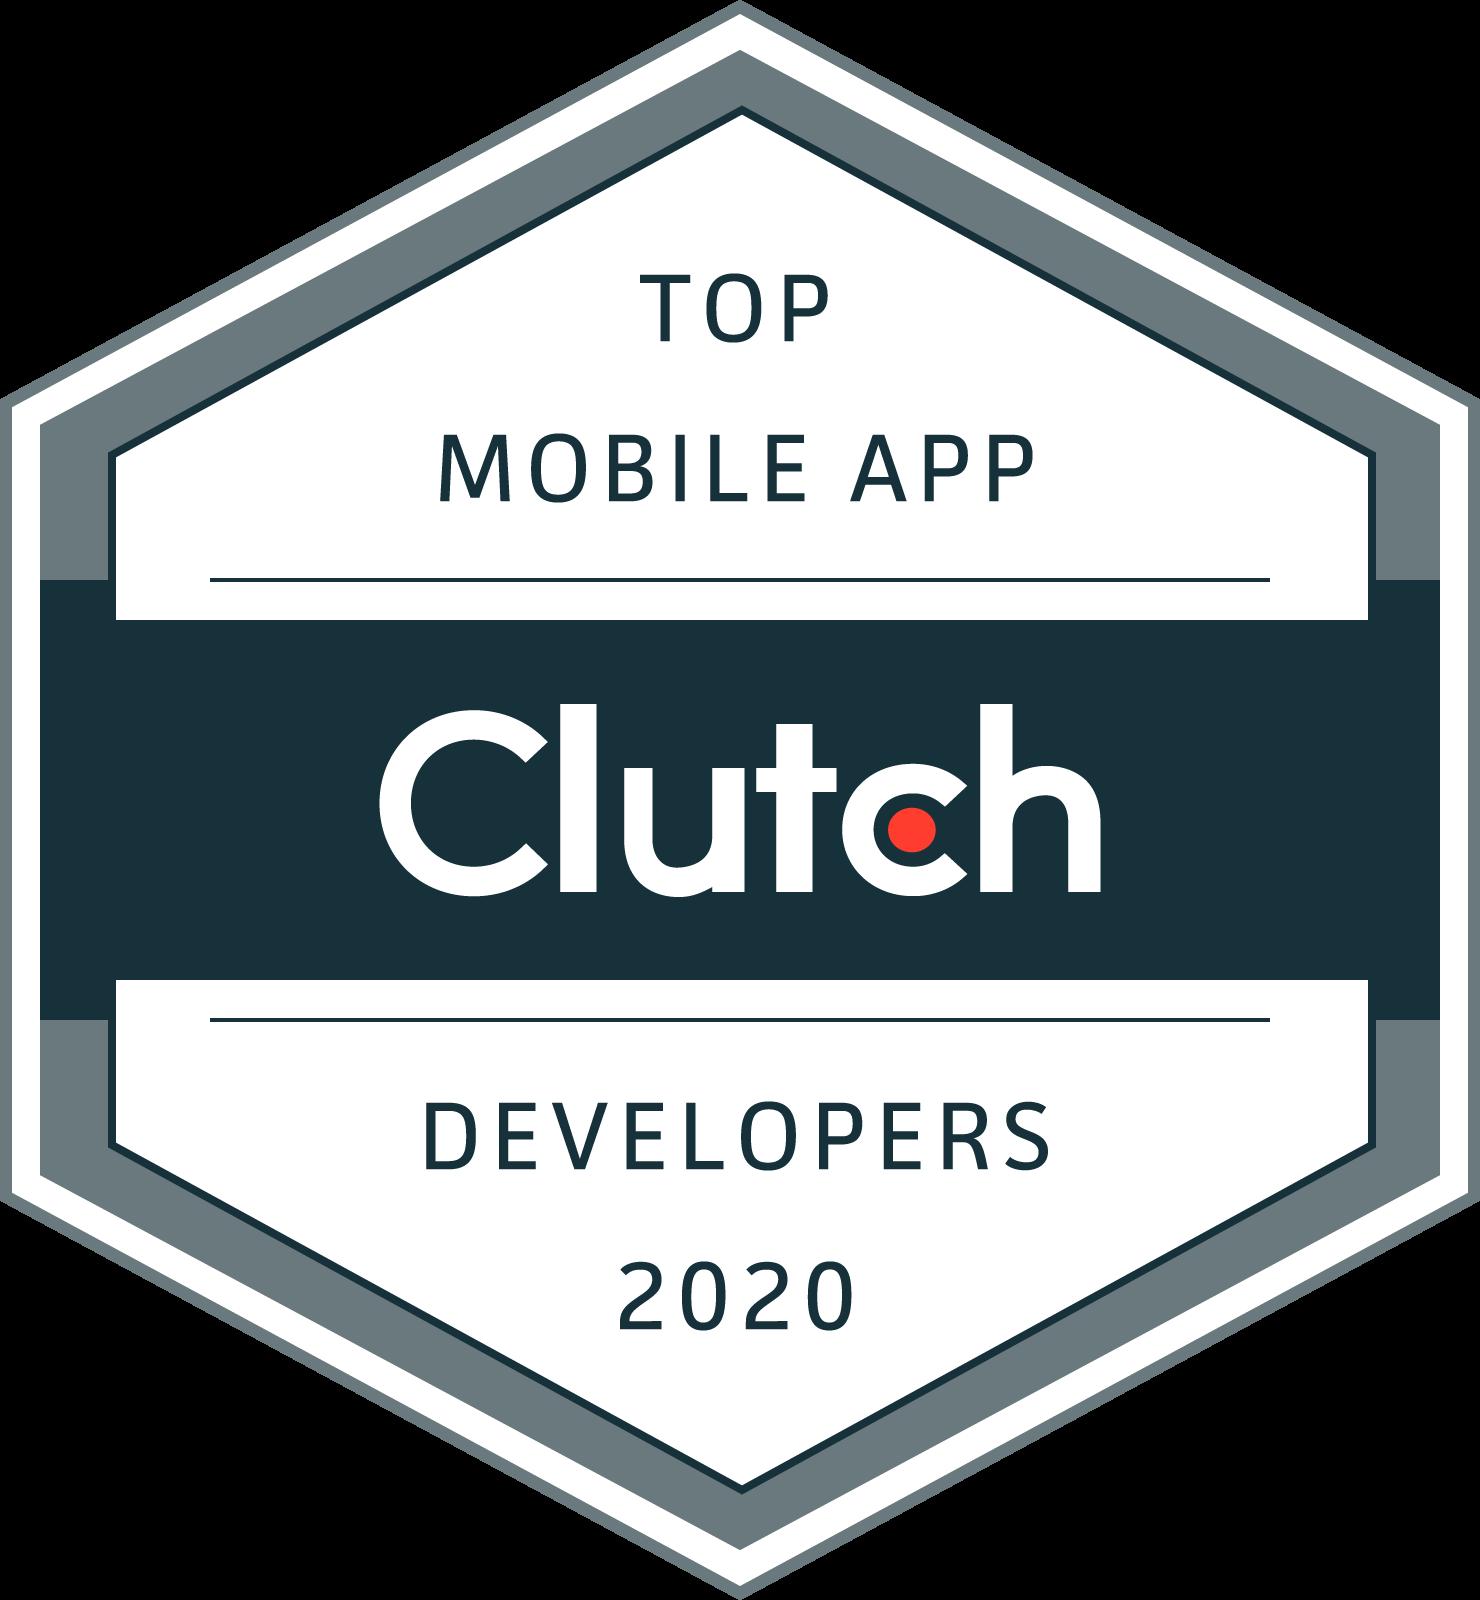 Clutch Top Mobile App Developers 2020 Badge